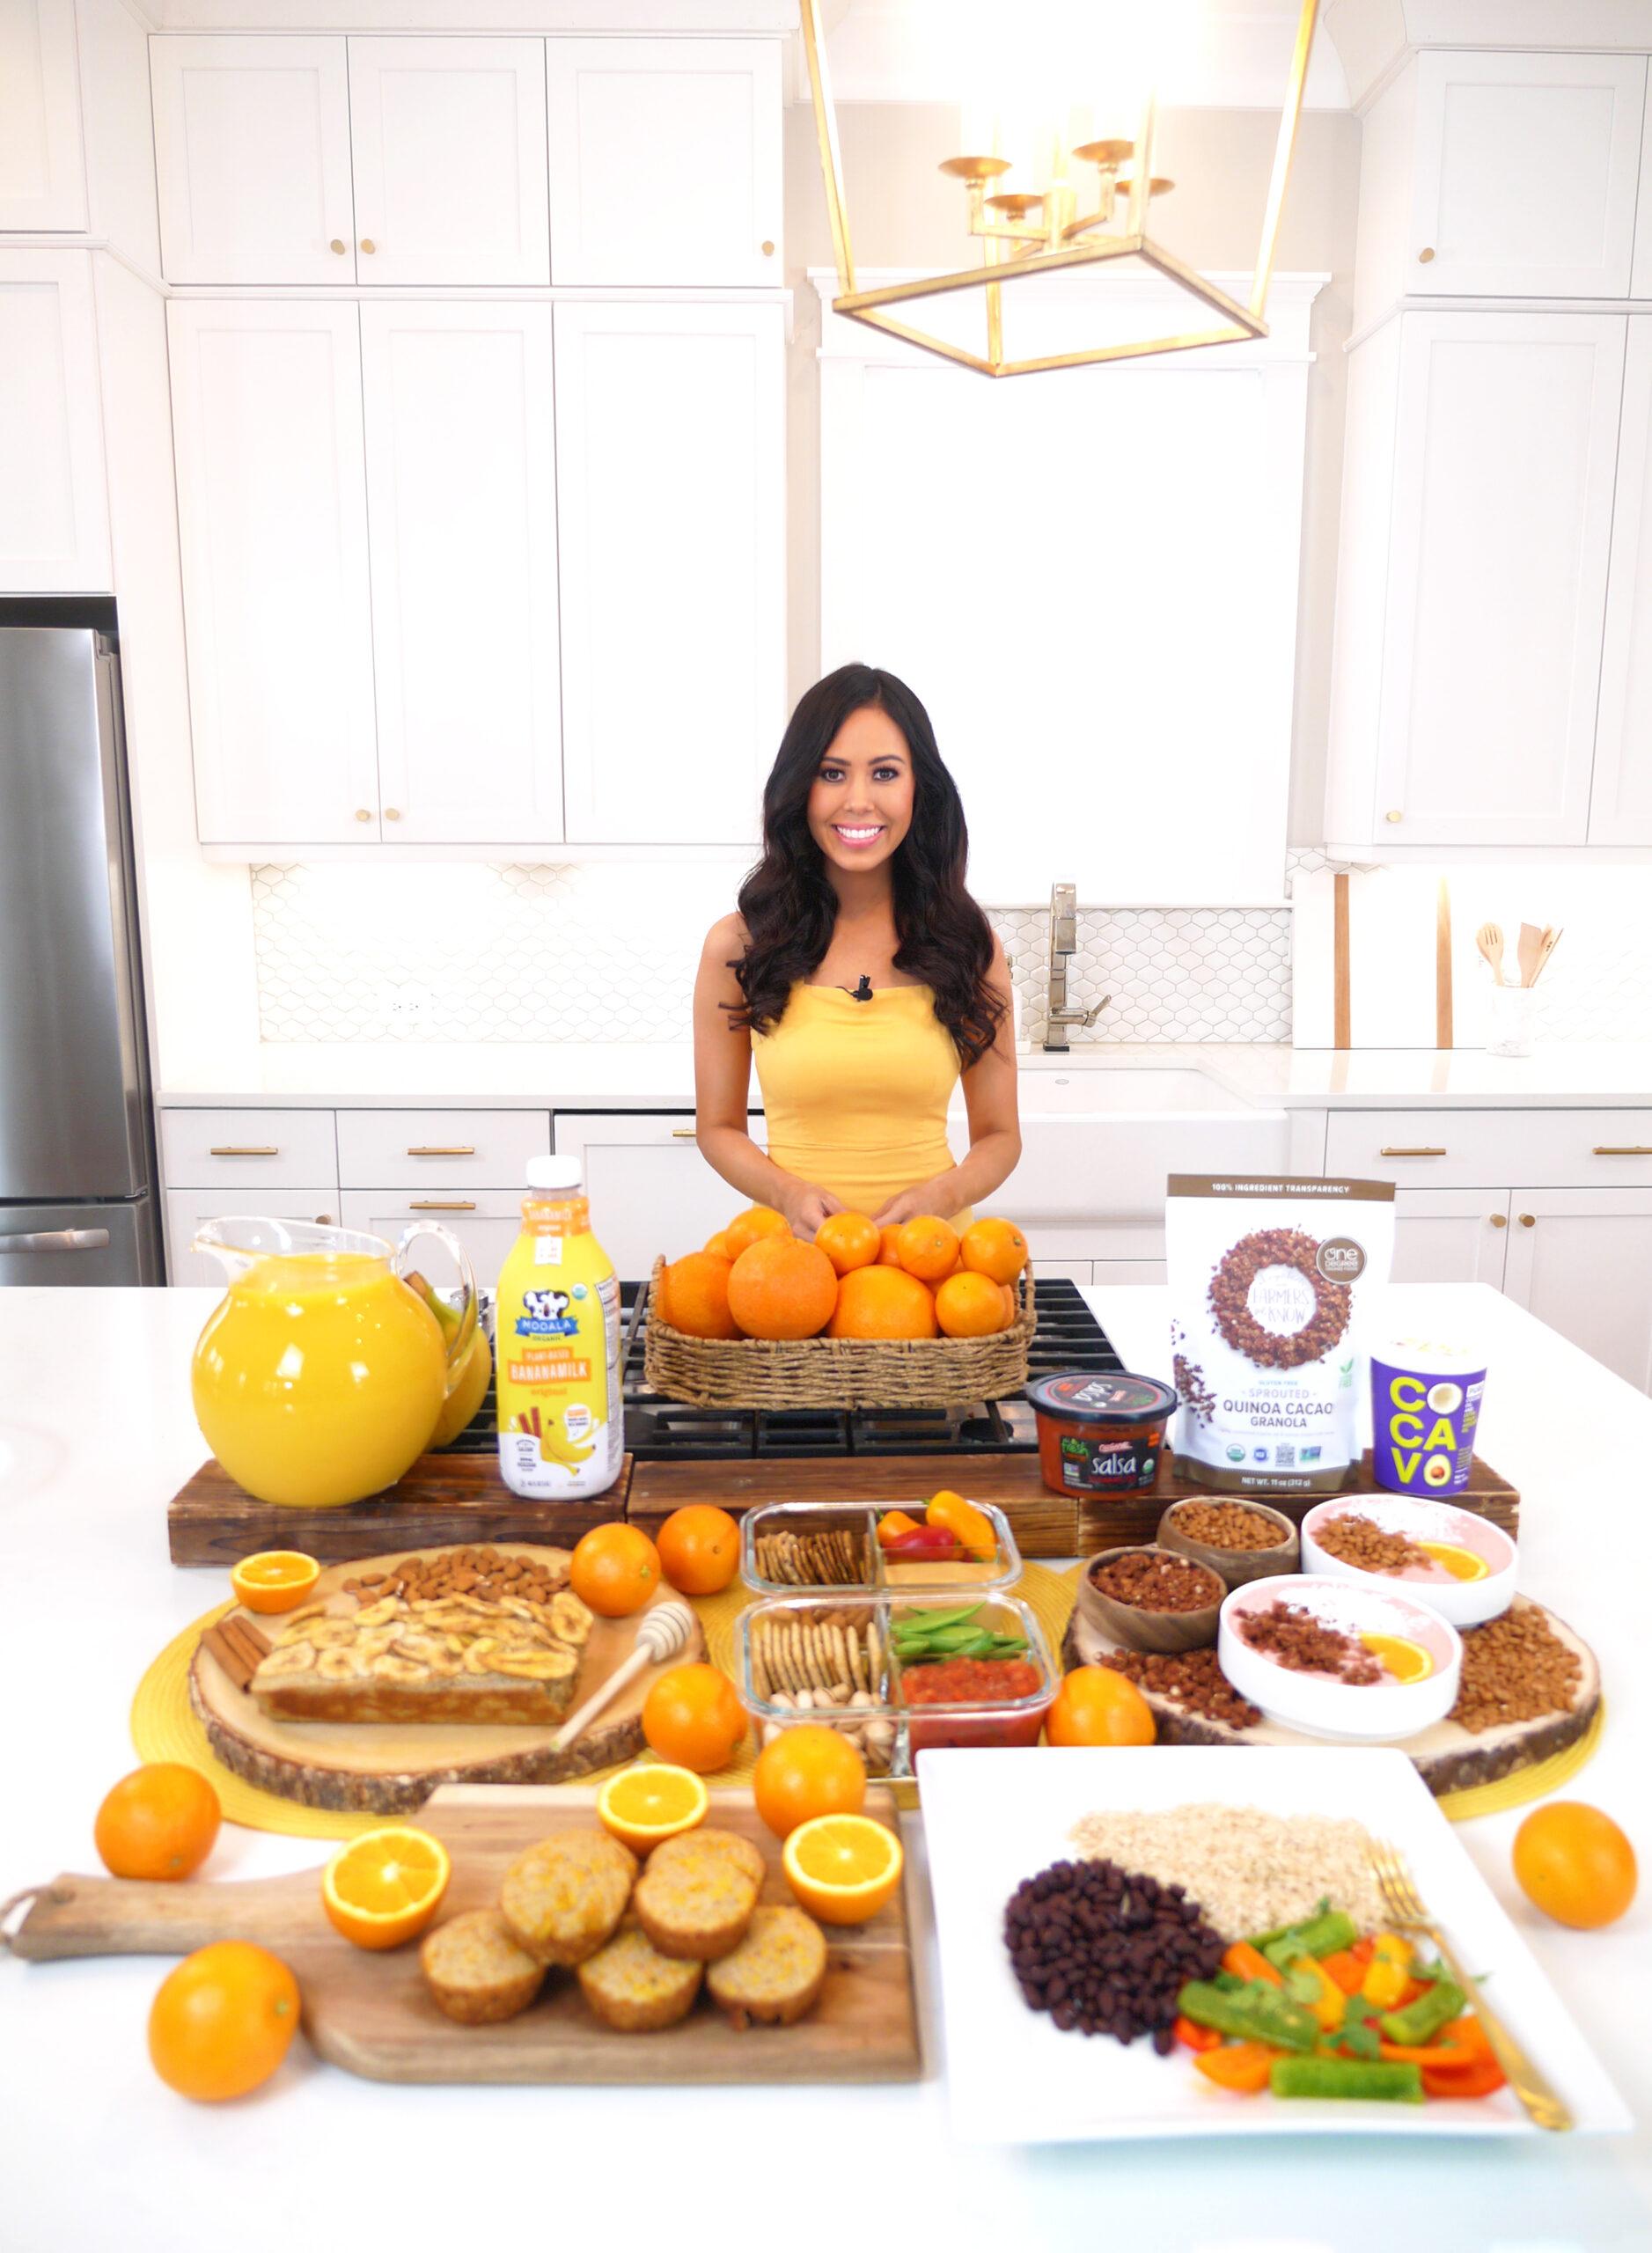 Mooala, One Degree Organics, Cocavo, Fresh Cravings Salsa, Florida 100% Orange Juice